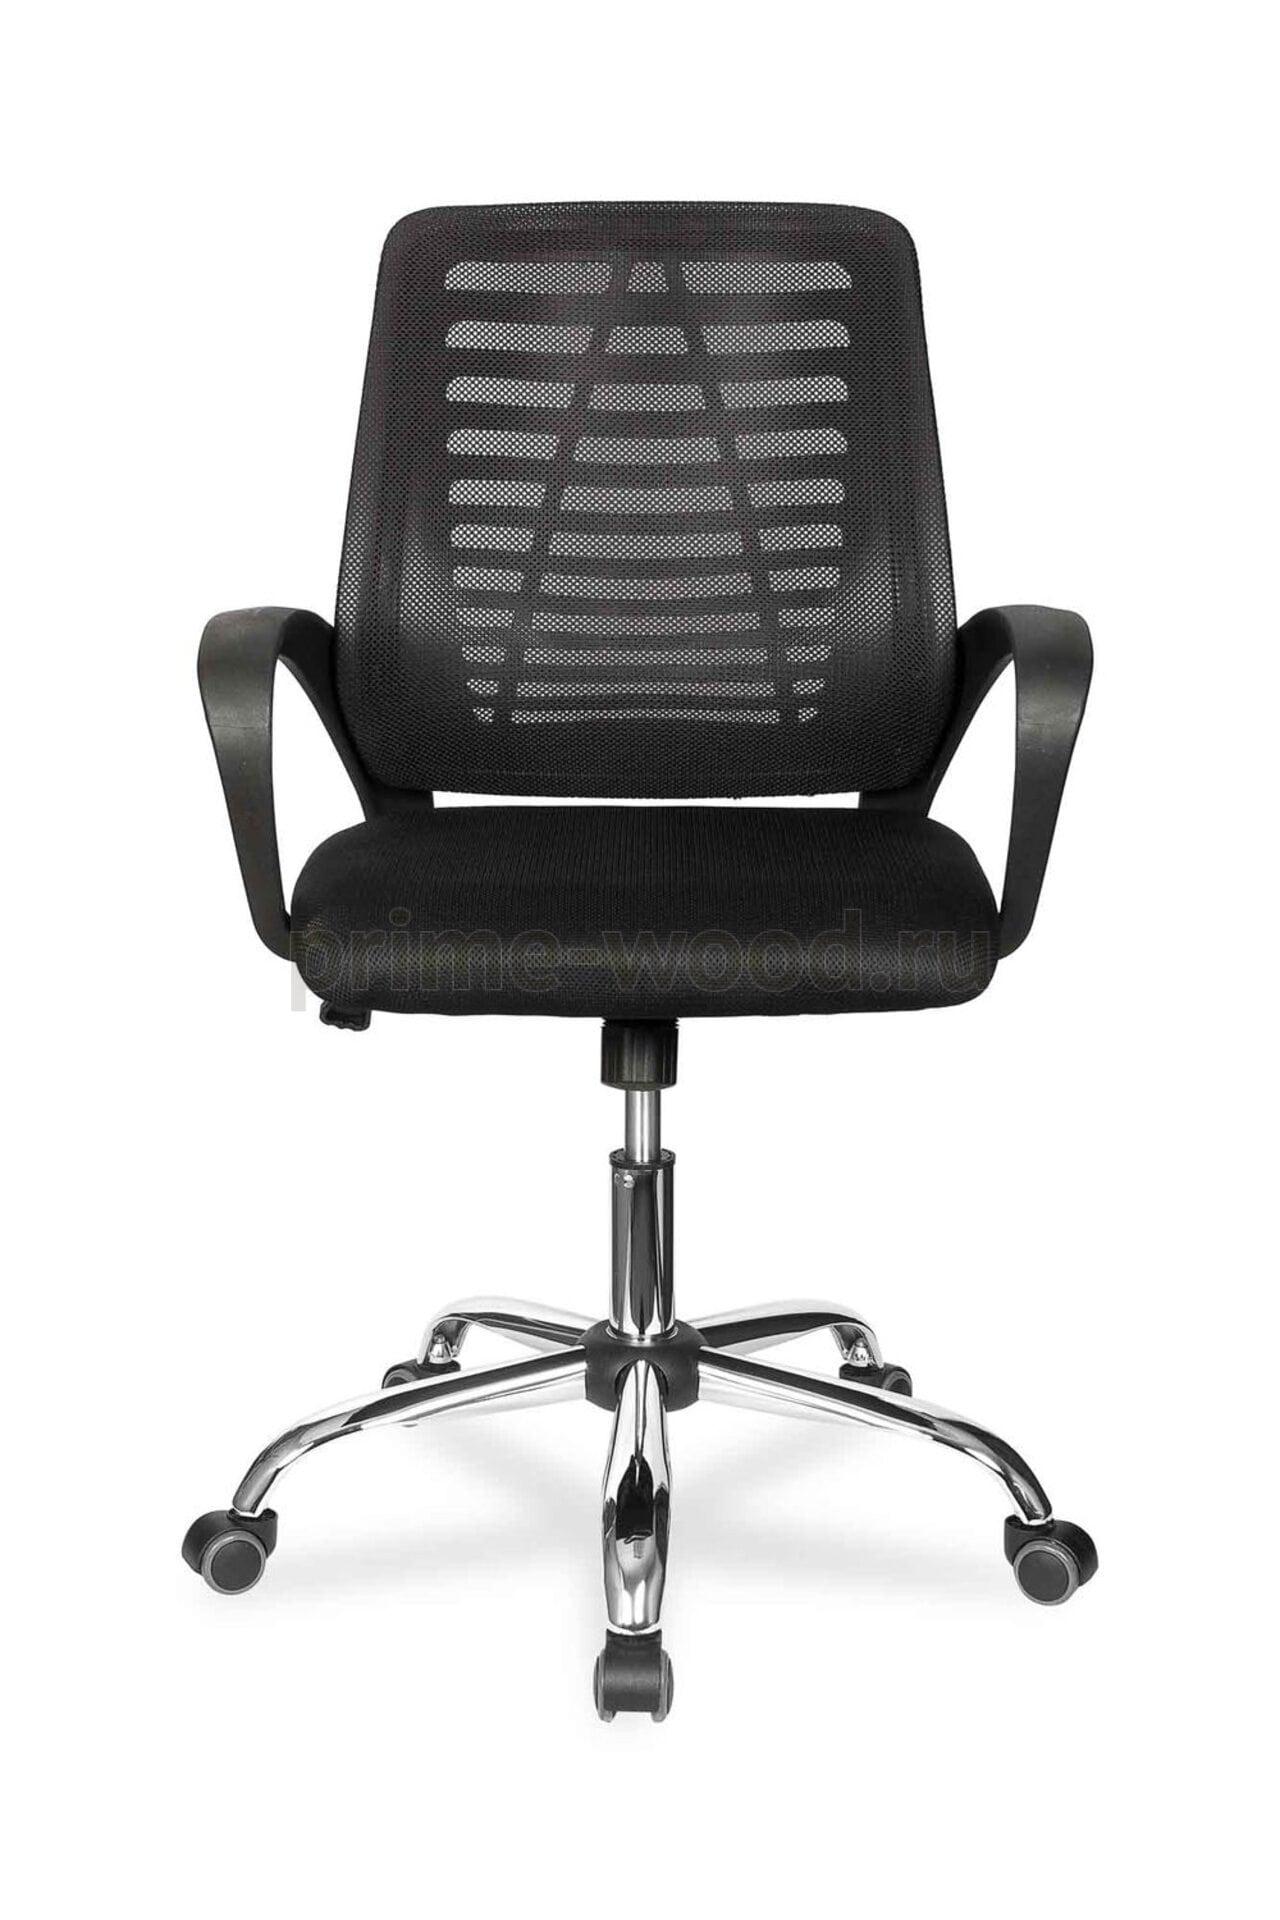 Кресло руководителя College CLG-422 MXH-B - фото 3